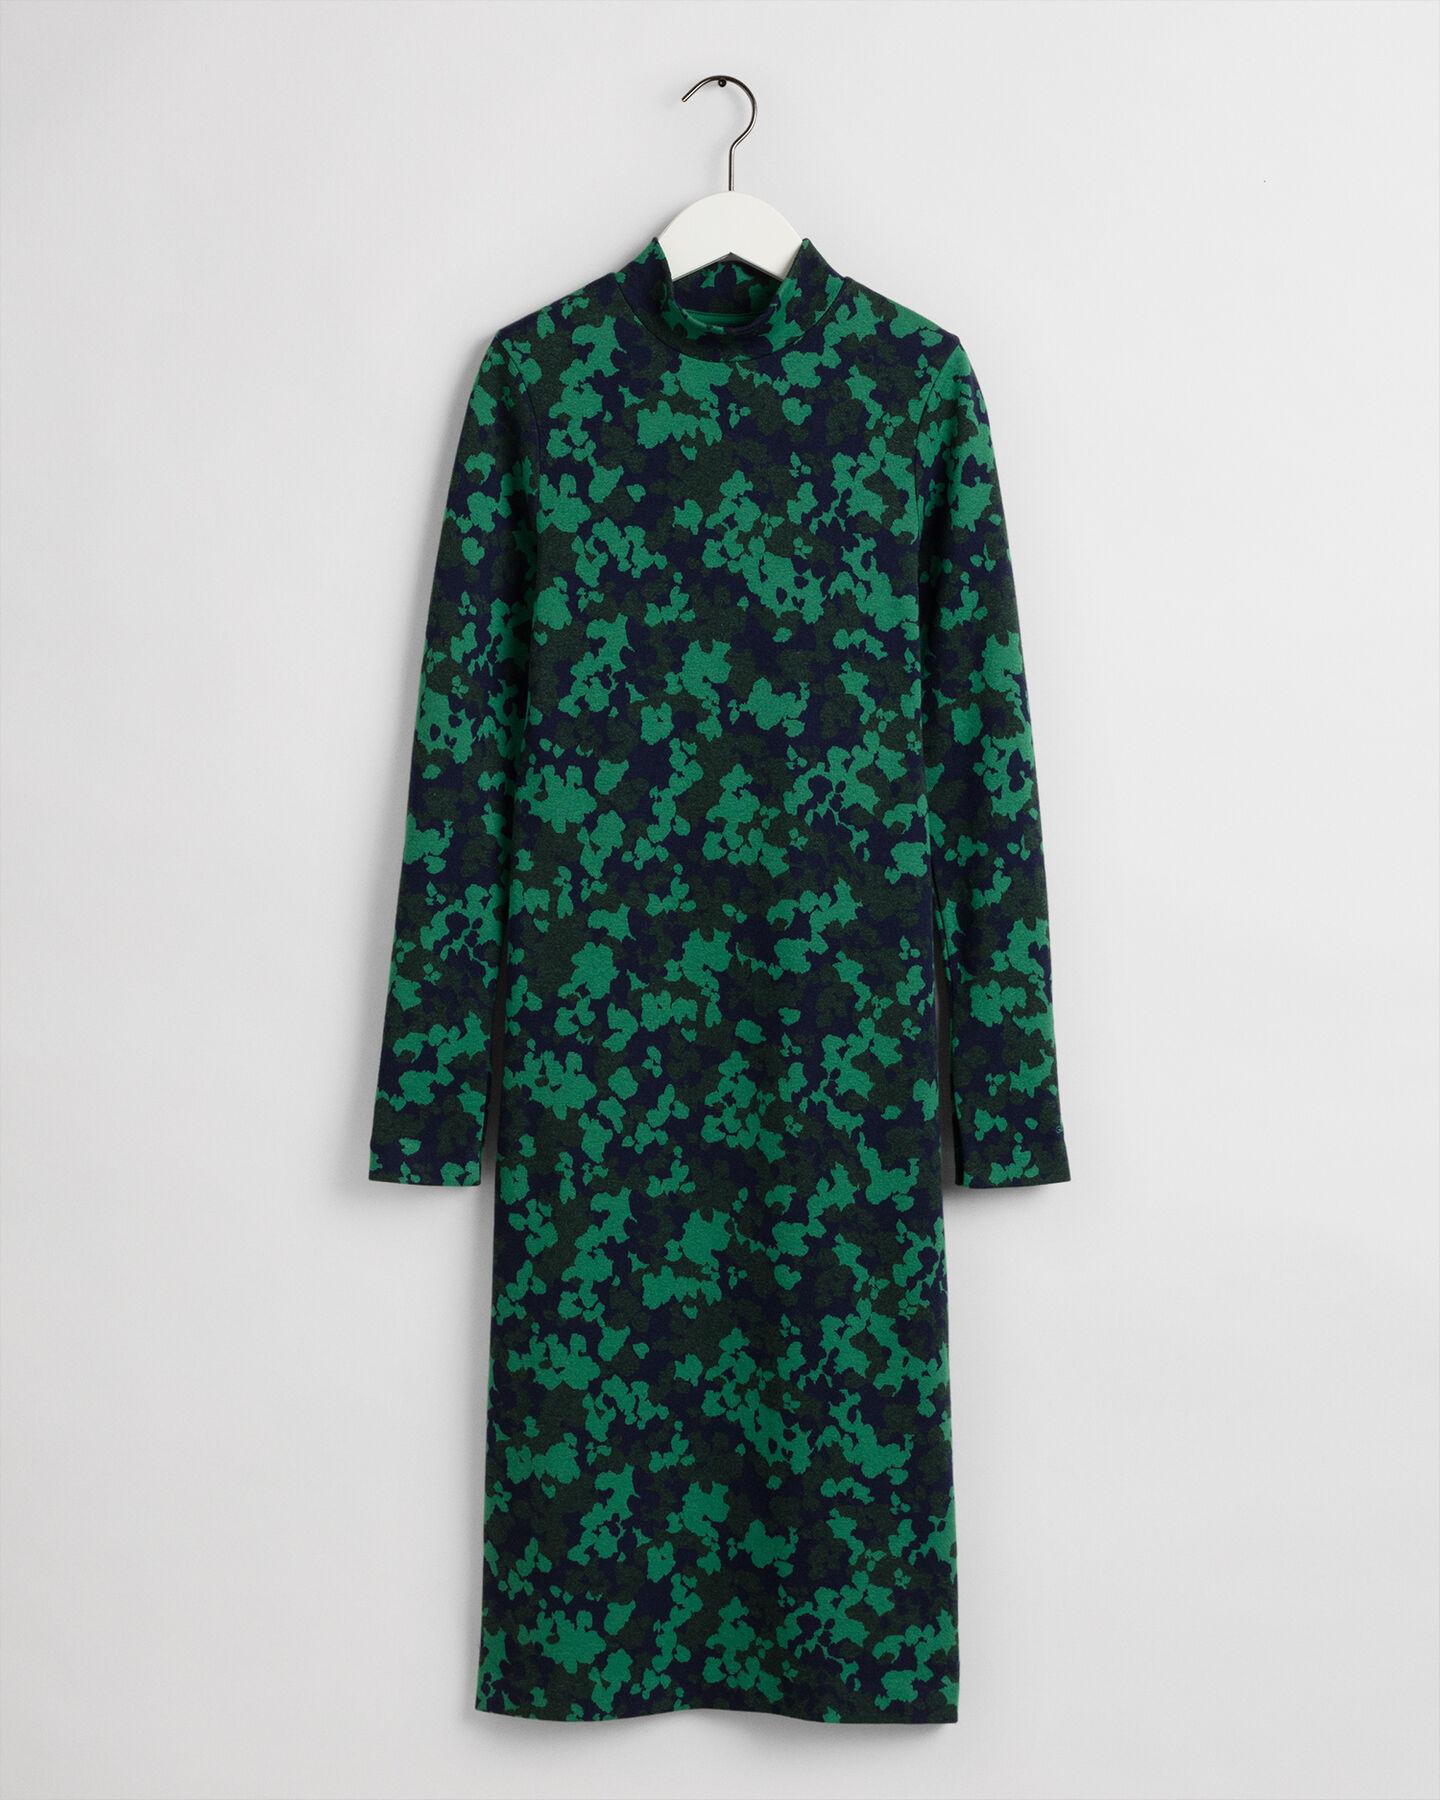 Jacquard Jerseykleid mit Blumenmuster